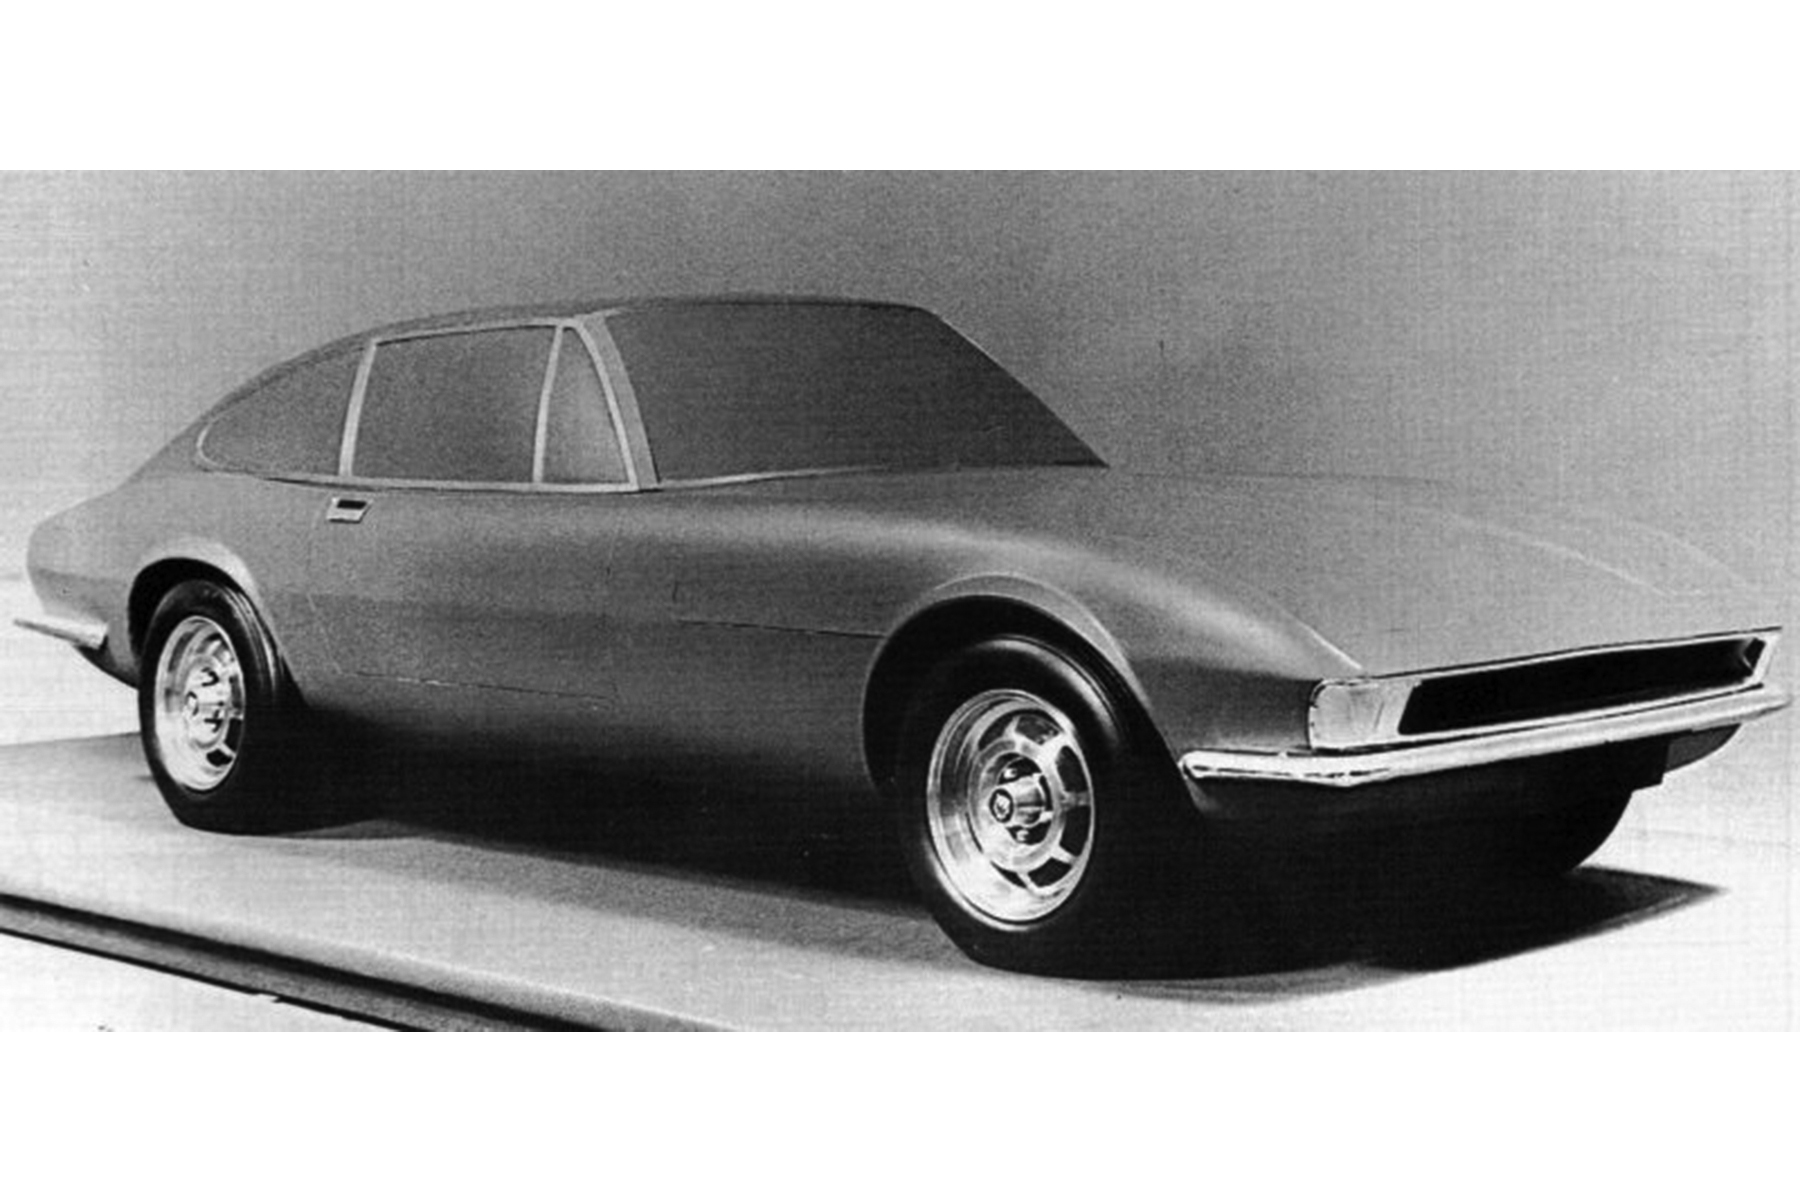 Jaguar Xj21 Secret E Type Replacement That Was Canned Before Launch 1970 Xj6 Art